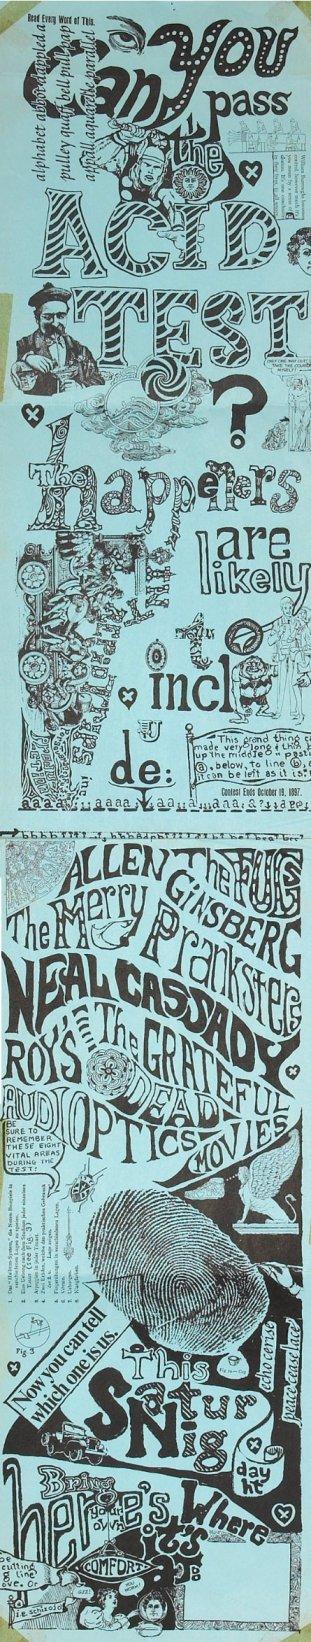 Grateful Dead - Affiches - Page 2 19660114